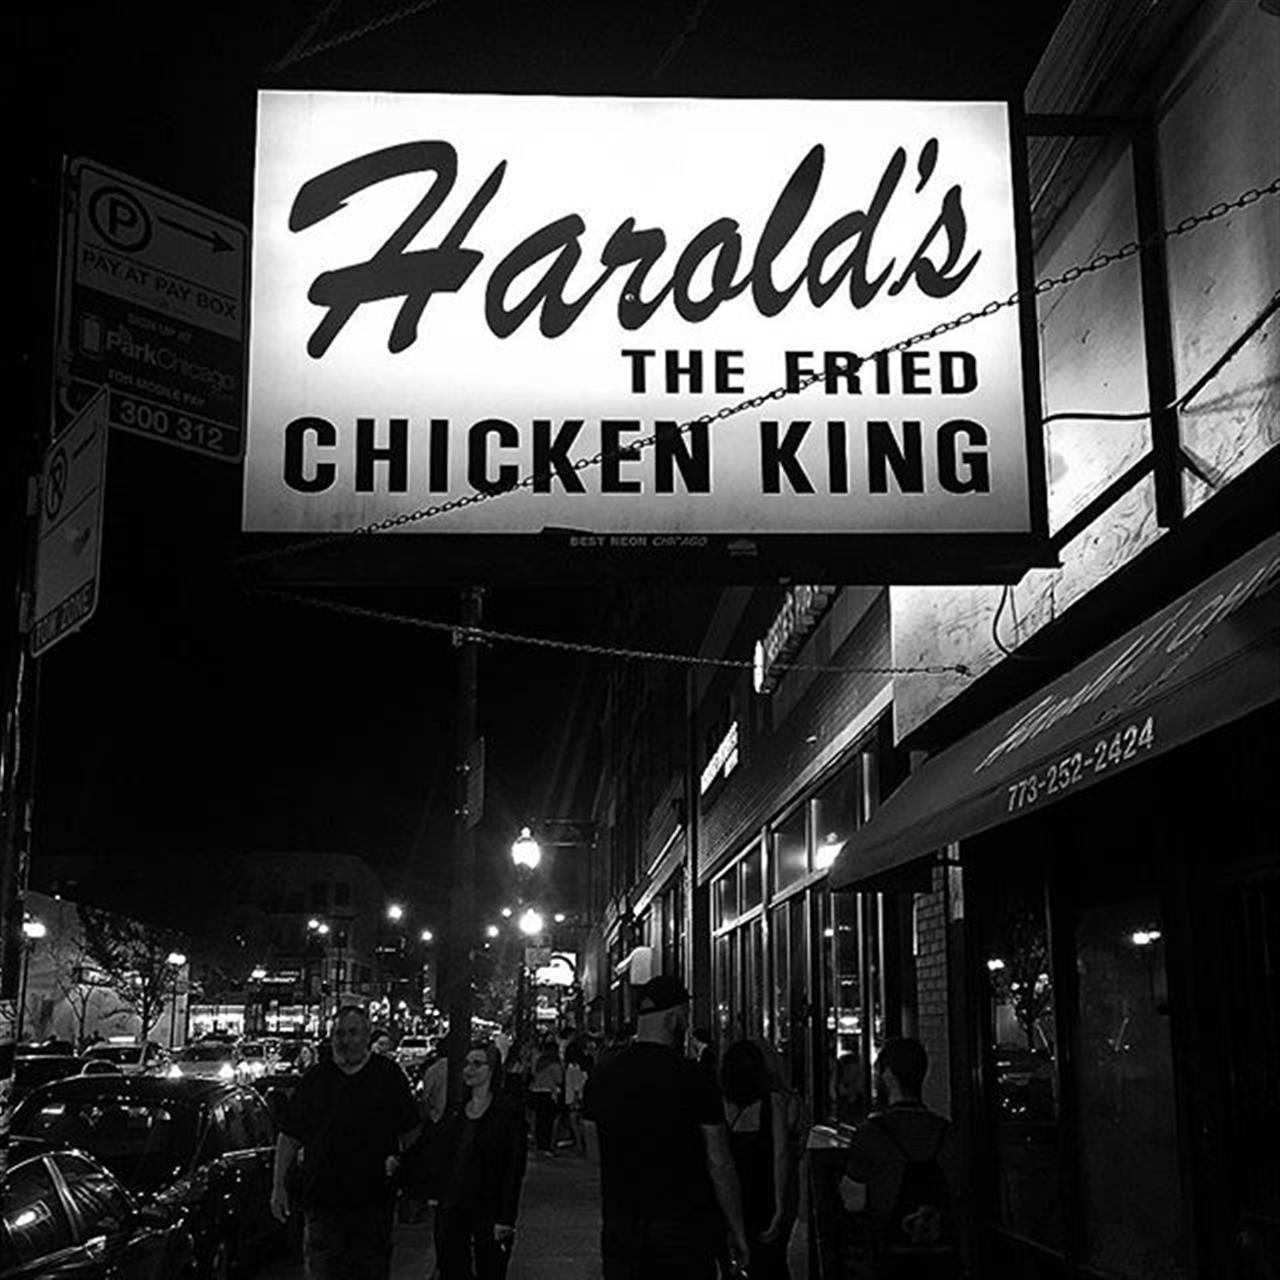 Heaven. #haroldschicken #friedchicken #chicago #wickerpark #leadingrelocal